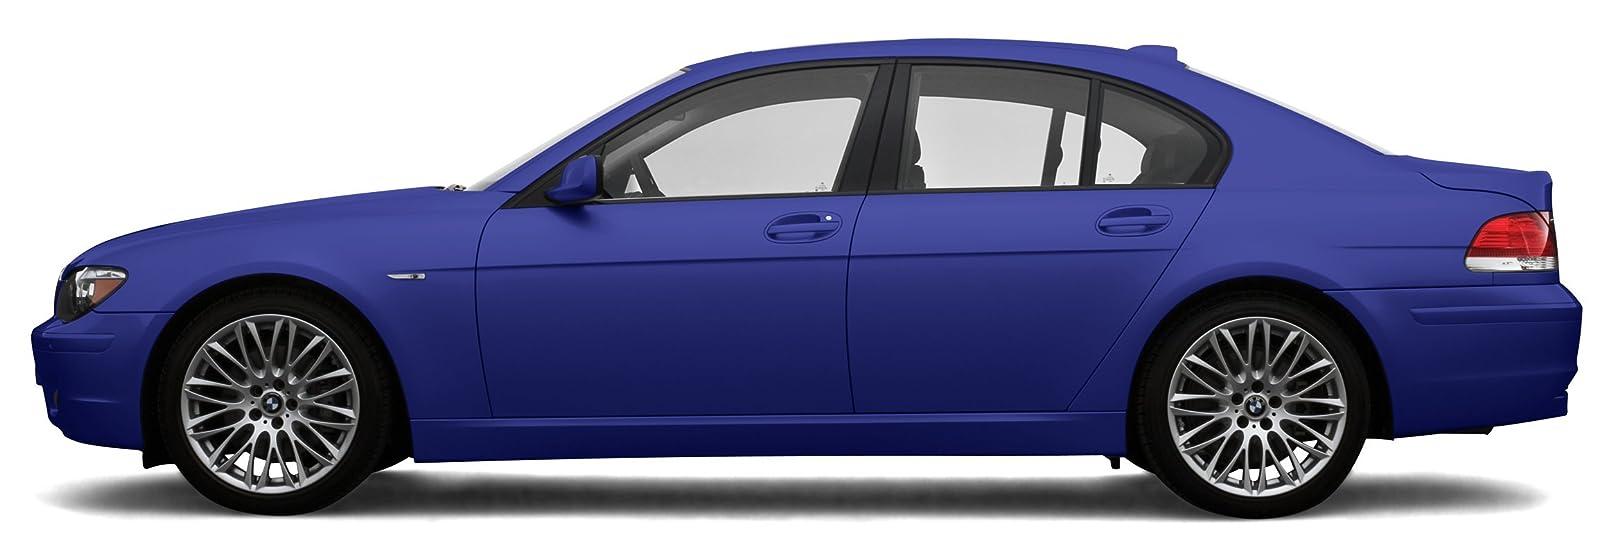 Amazoncom BMW Alpina B Reviews Images And Specs Vehicles - Alpina b7 specs